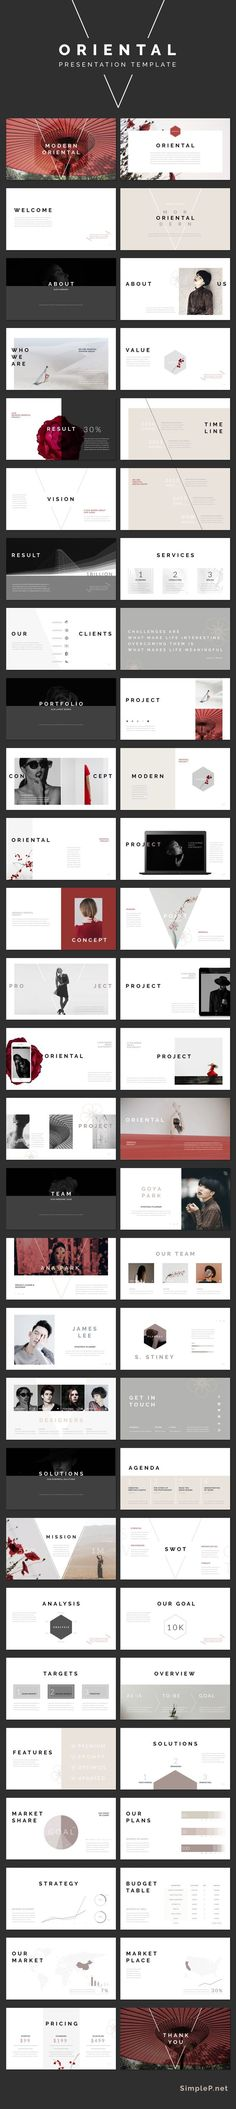 Oriental PowerPoint PPT Presentation Template #ppttemplate #asian #japanese #business #marketing #portfolio